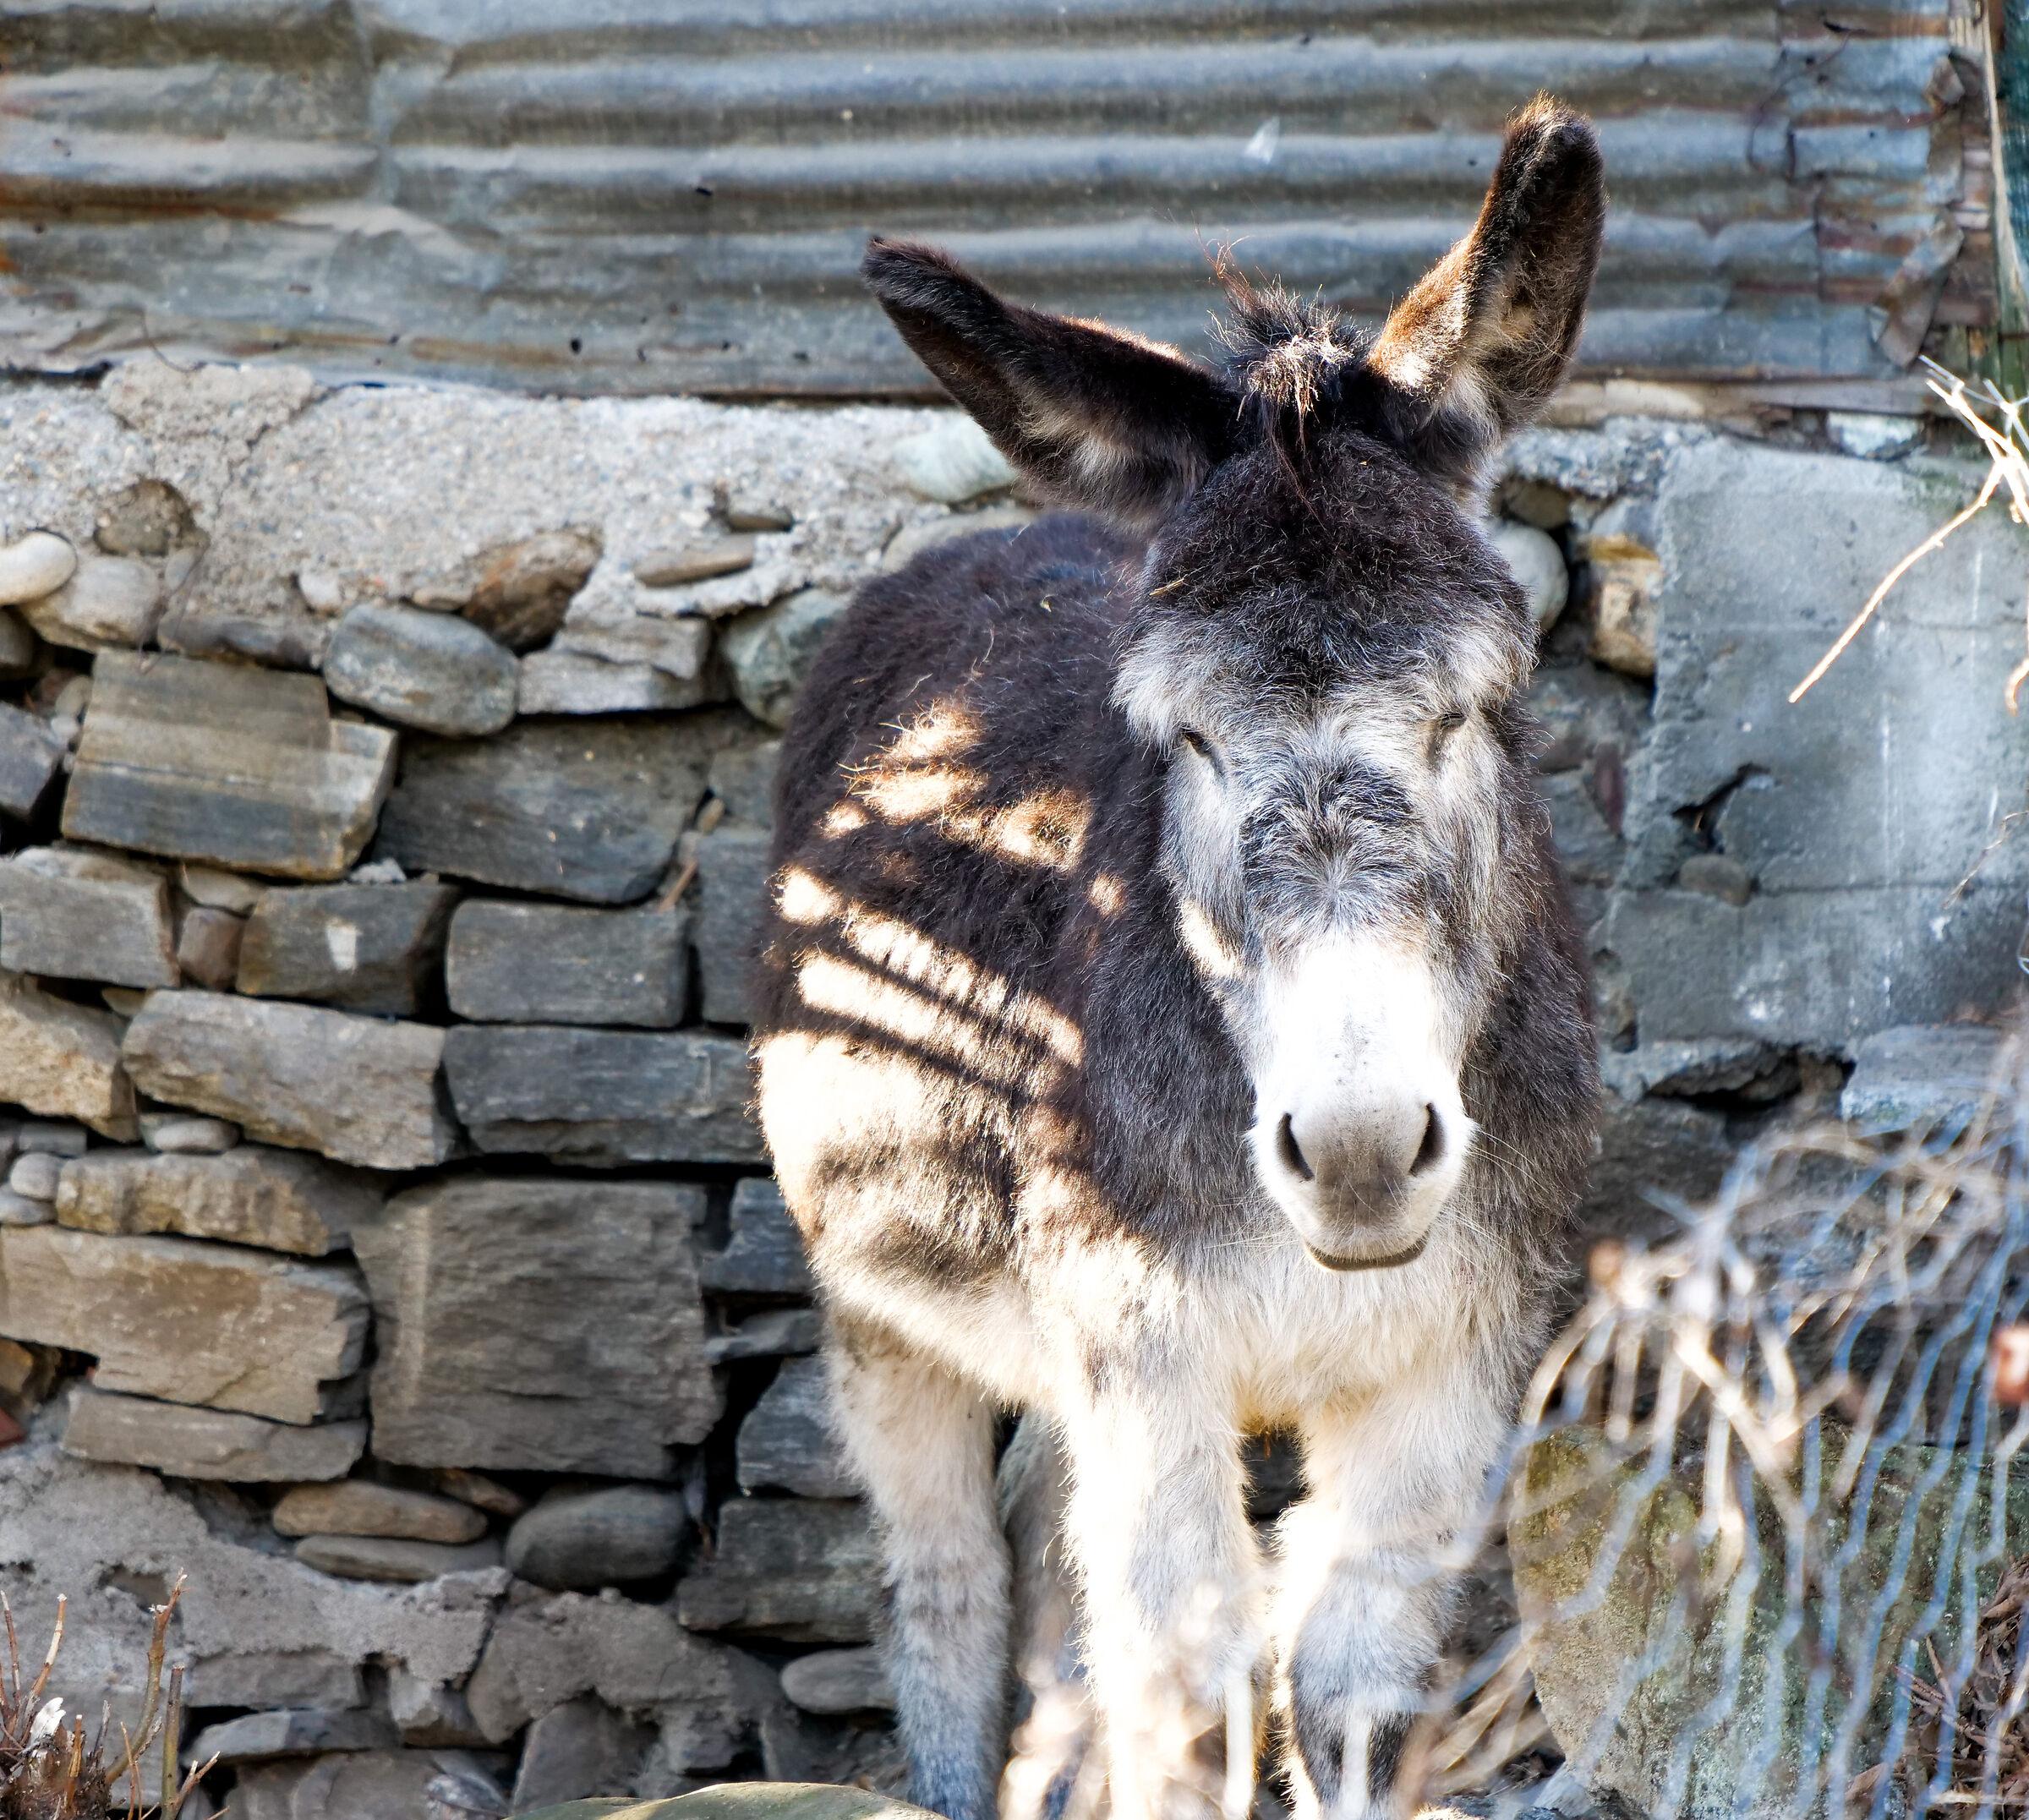 Donkey of the year...